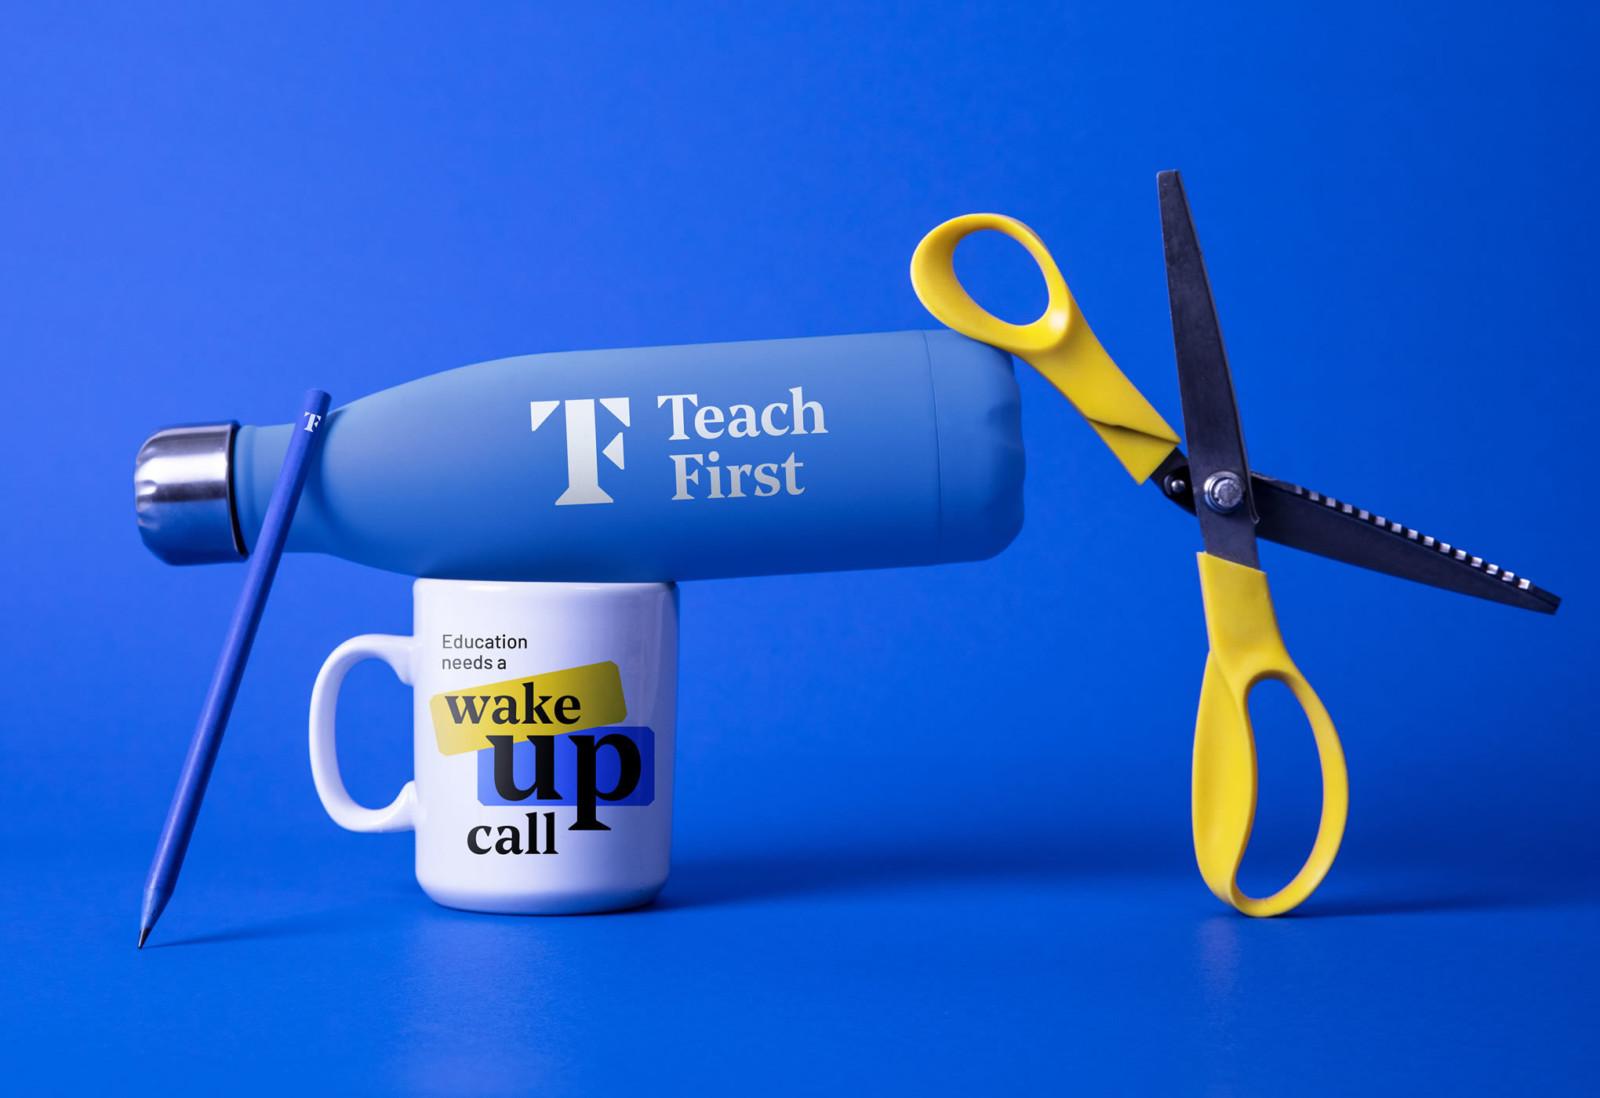 Teach First image